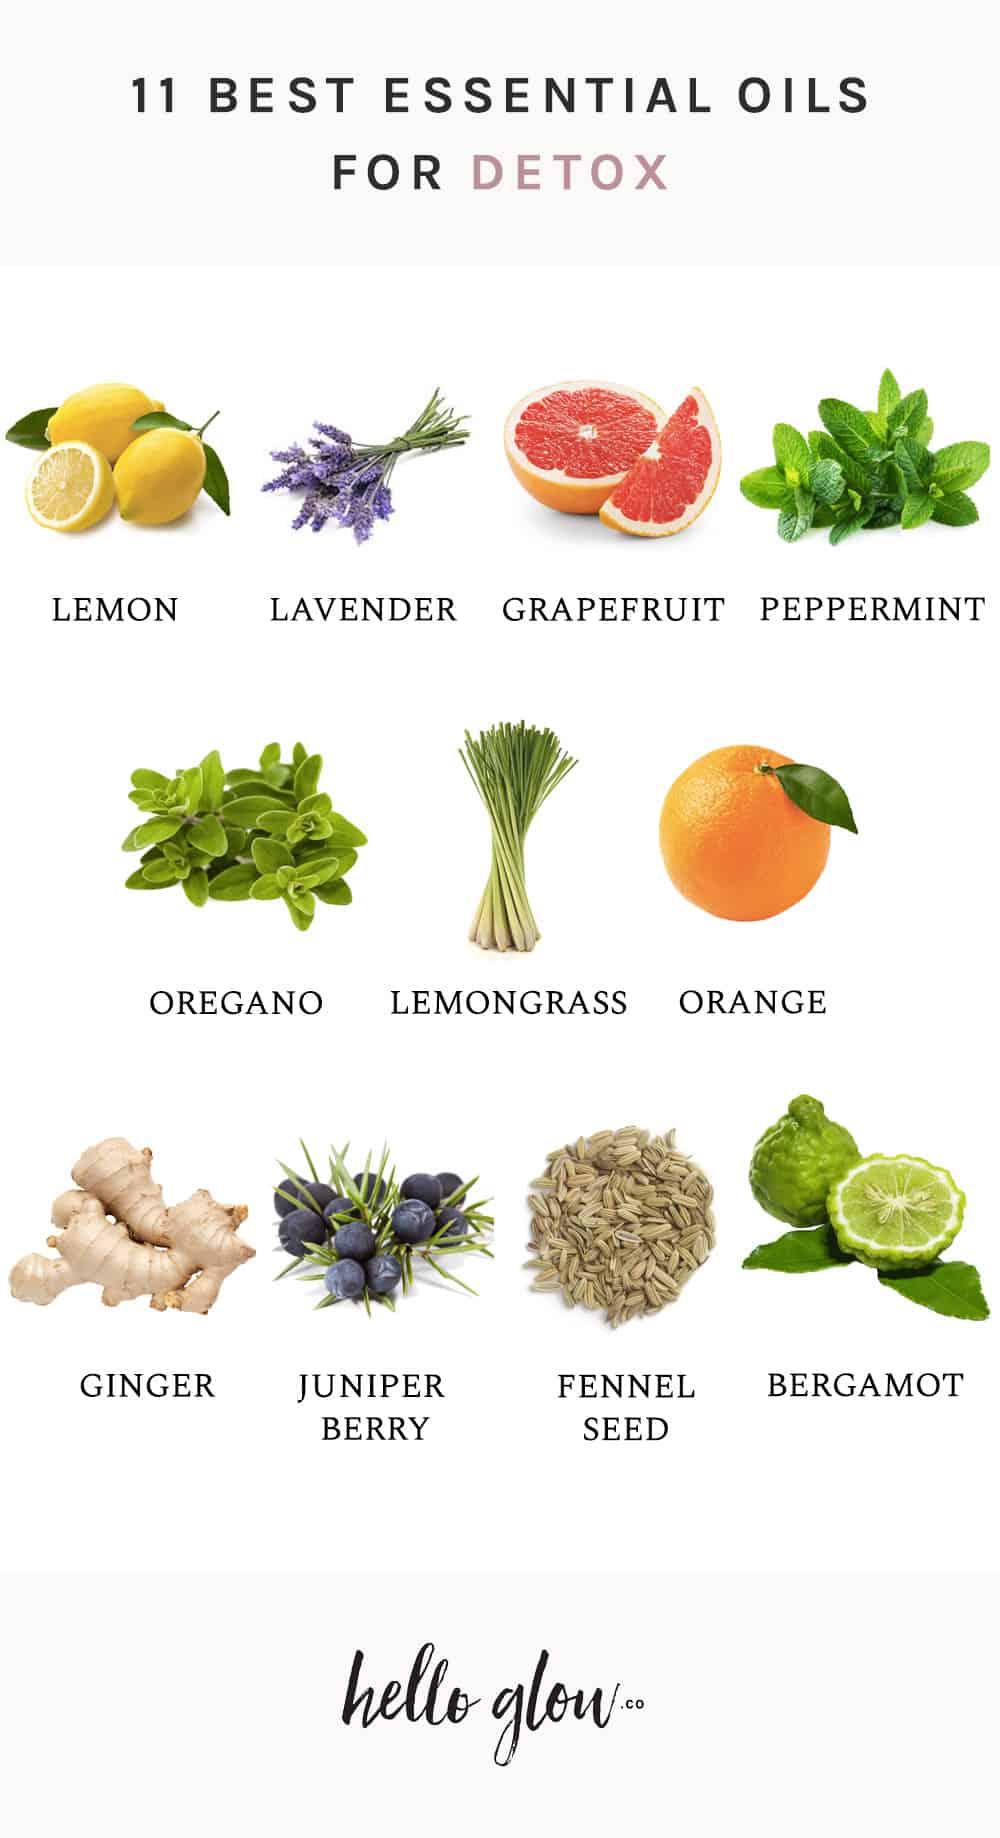 10 Best Essential Oils for Detox